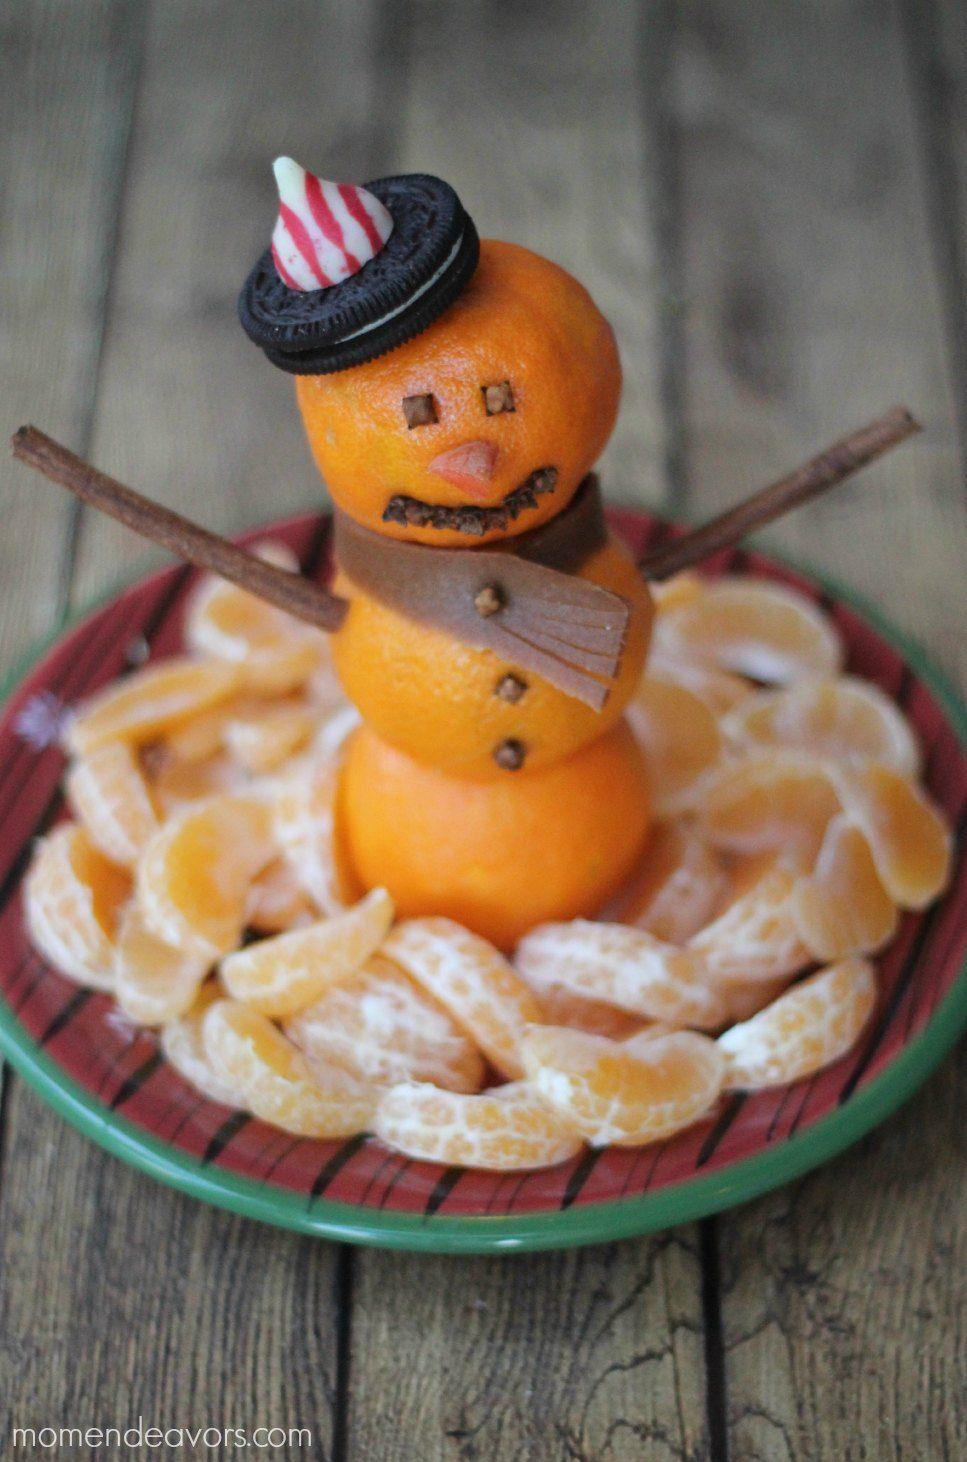 Fun Food Kids Snowman Christmas Fruit winter schneemann Platter obst fruits obsteller clementinen mandarinen Weihnachten gesund healthy snack